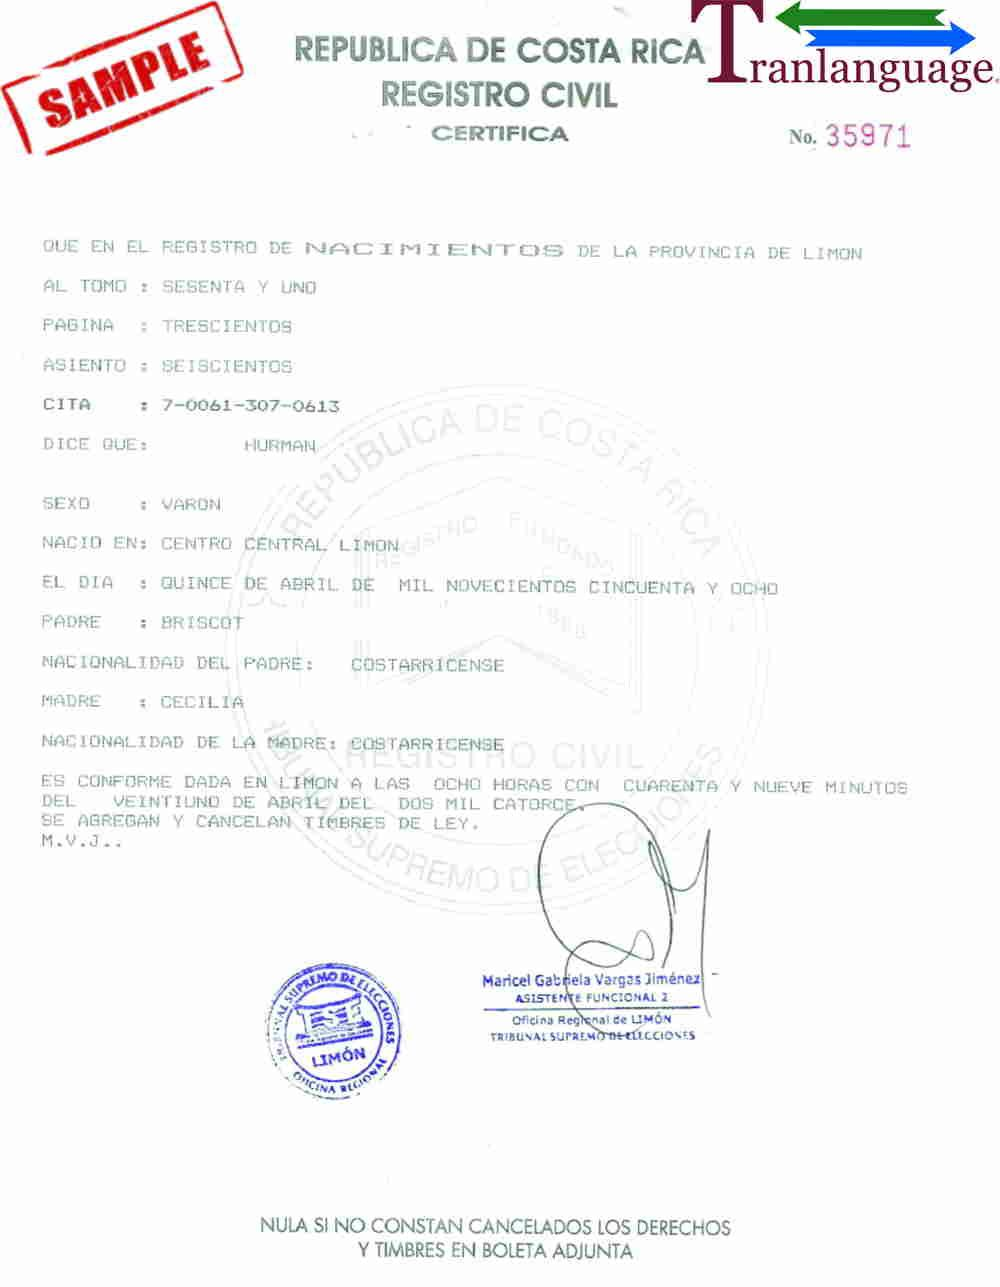 Birth Certificate Costa Rica With Birth Certificate Translation Template Uscis Business Template Certificate Of Recognition Template Birth Certificate